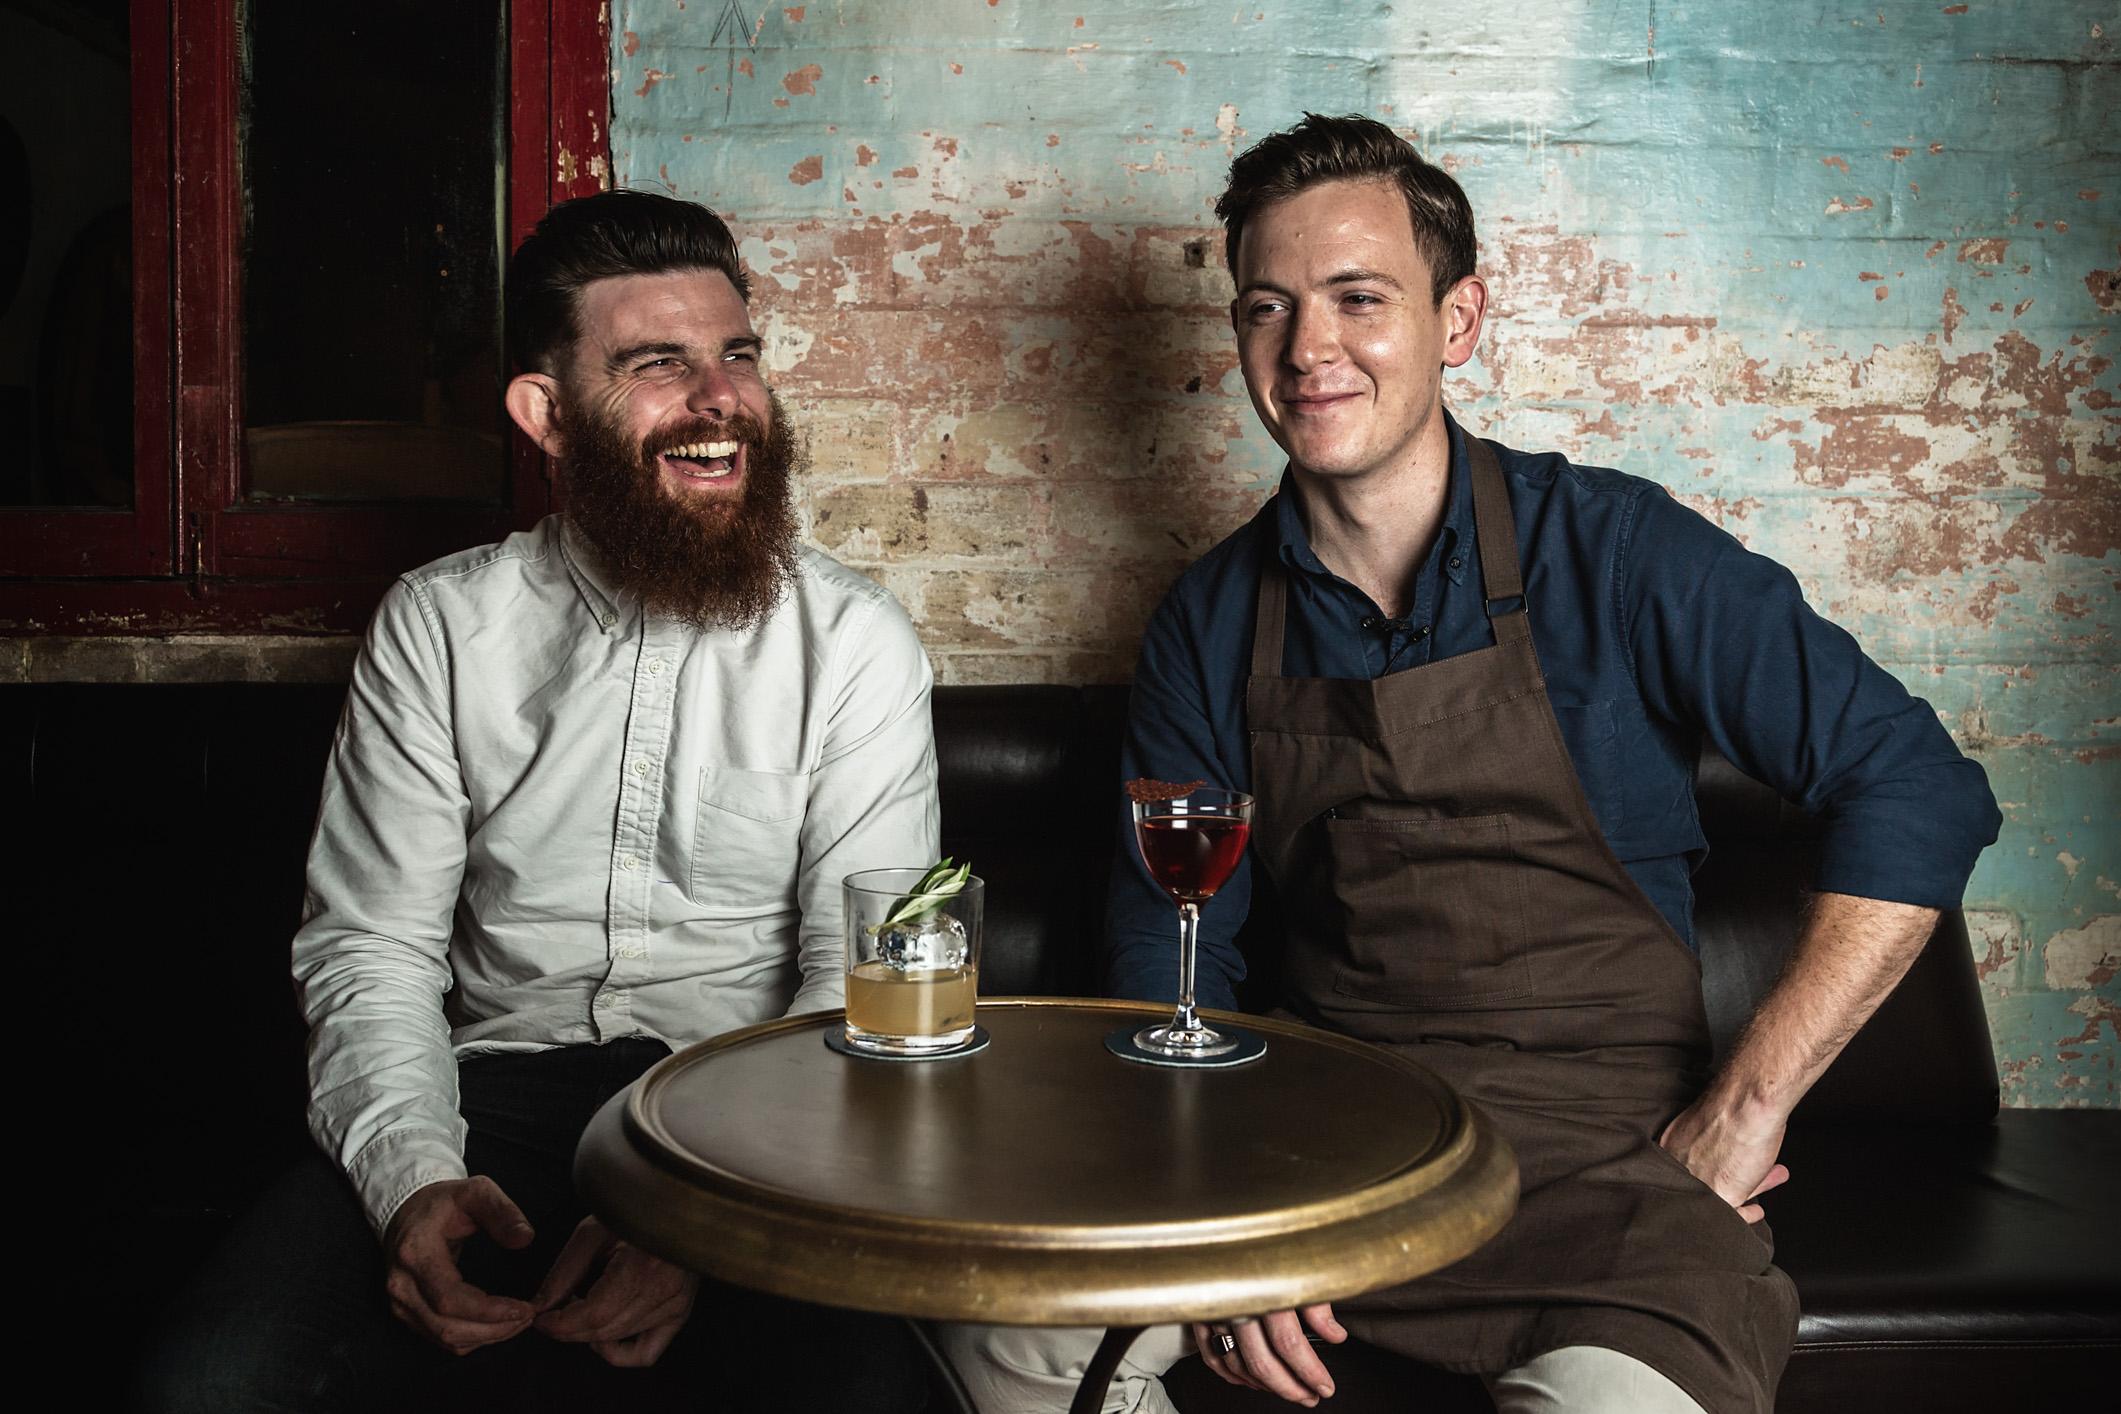 Toby Marshall (left), and Sam Egerton